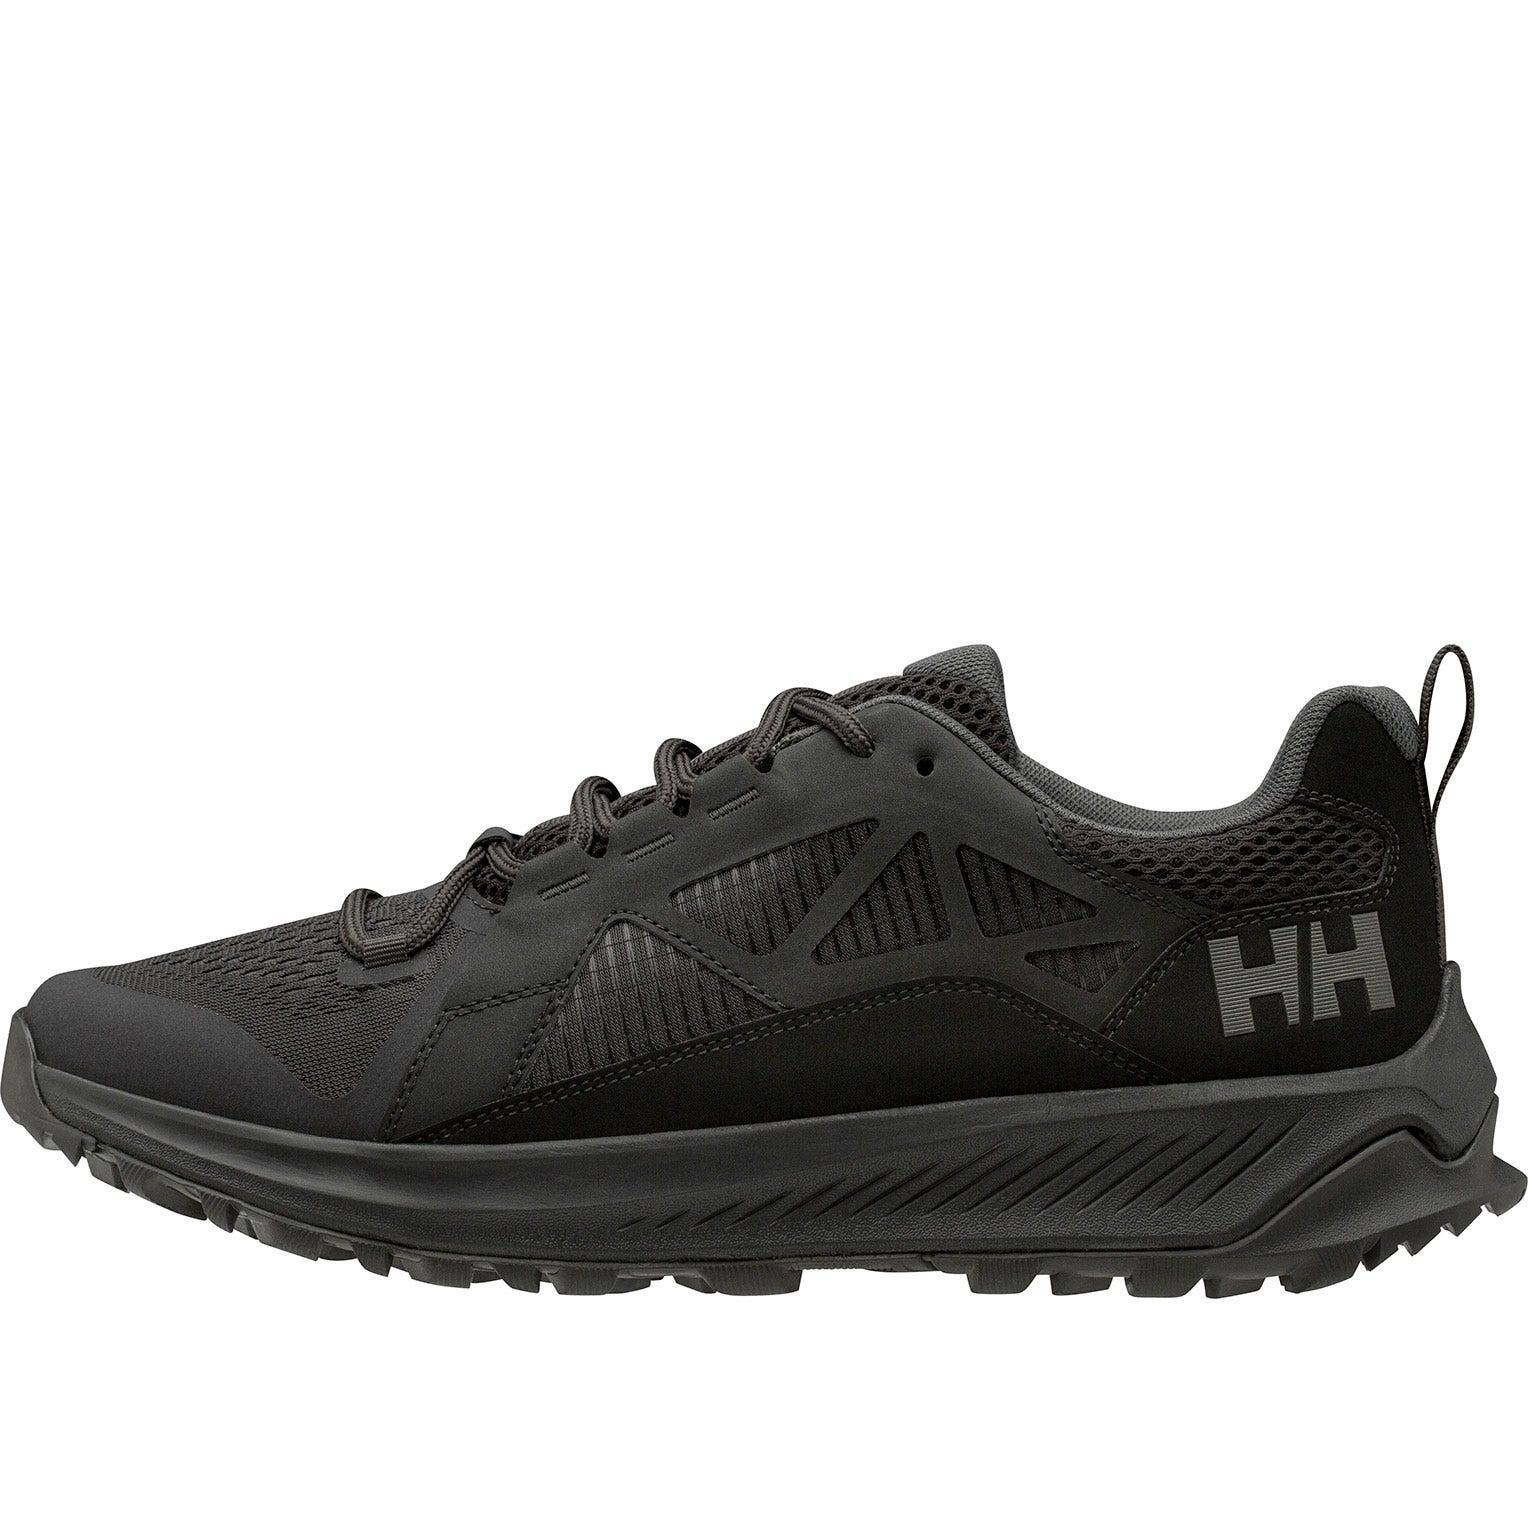 Helly Hansen Men's Gobi Aps Breathable Quick-dry Shoes 6.5